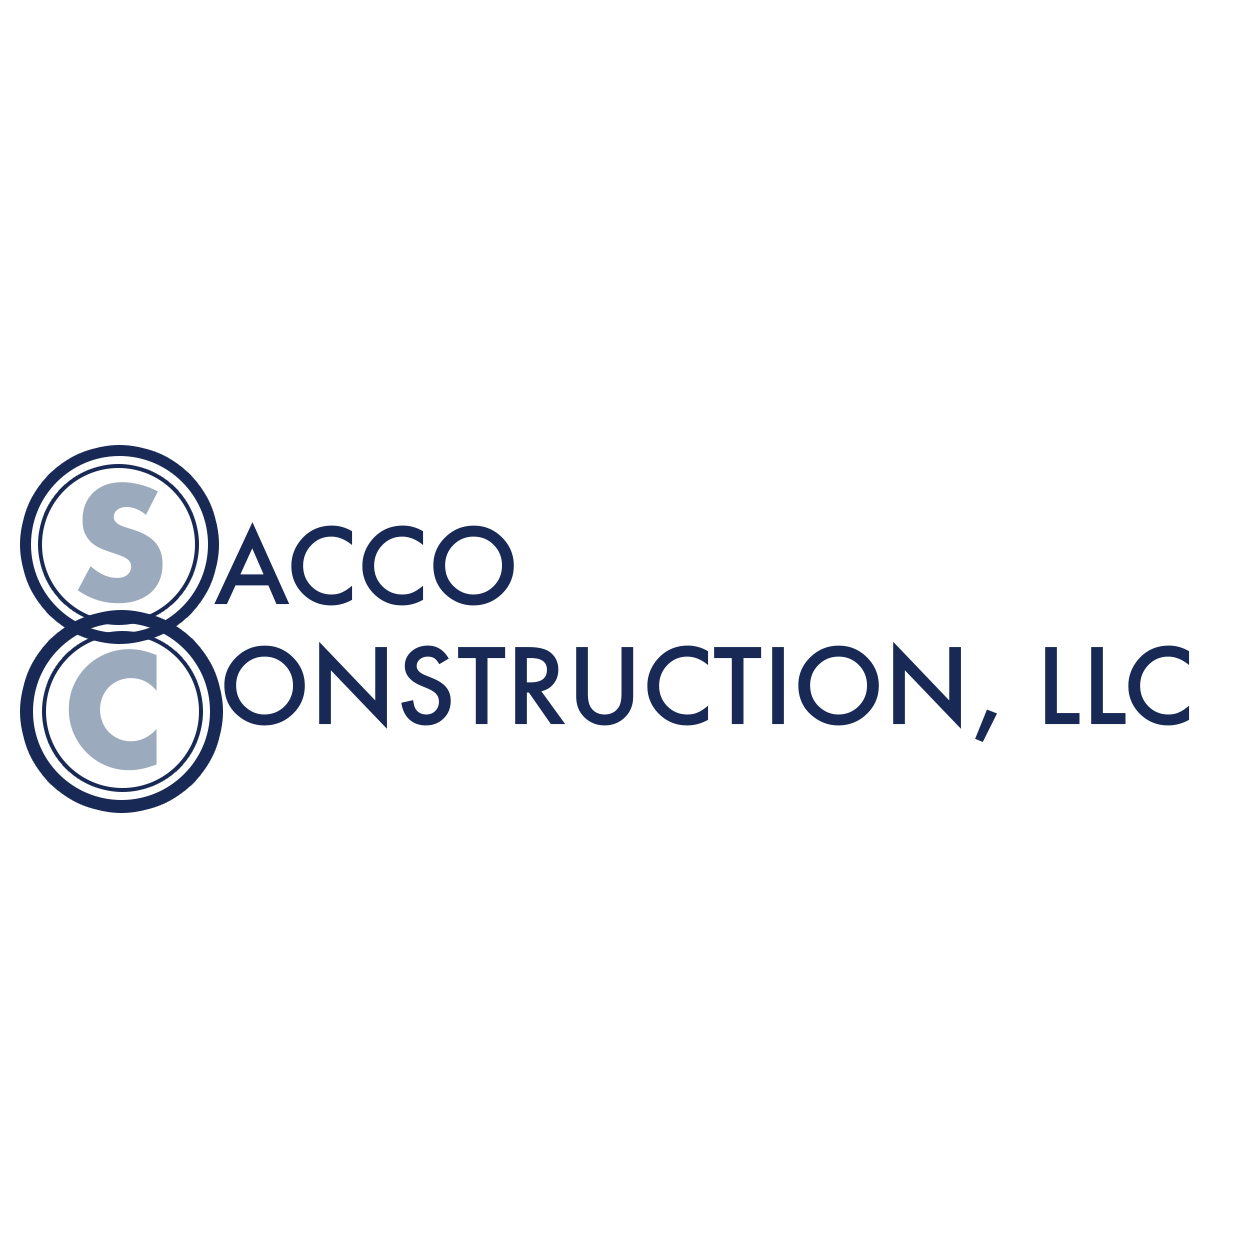 Sacco Construction, LLC Logo